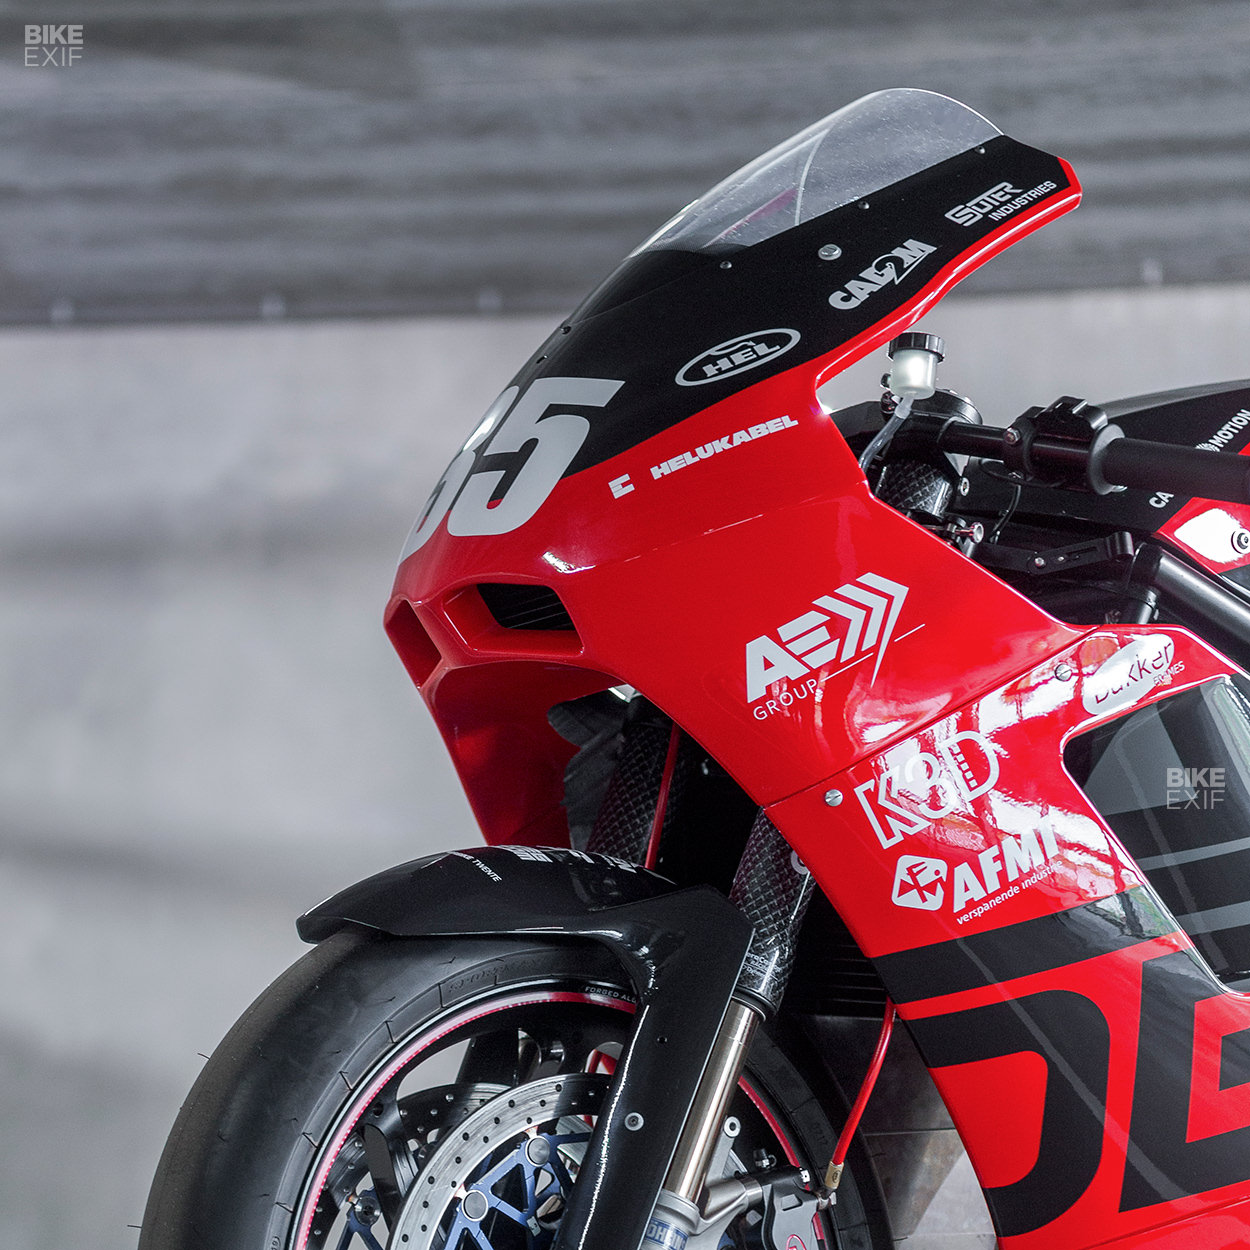 Delta-XE by Electric Superbike Twente